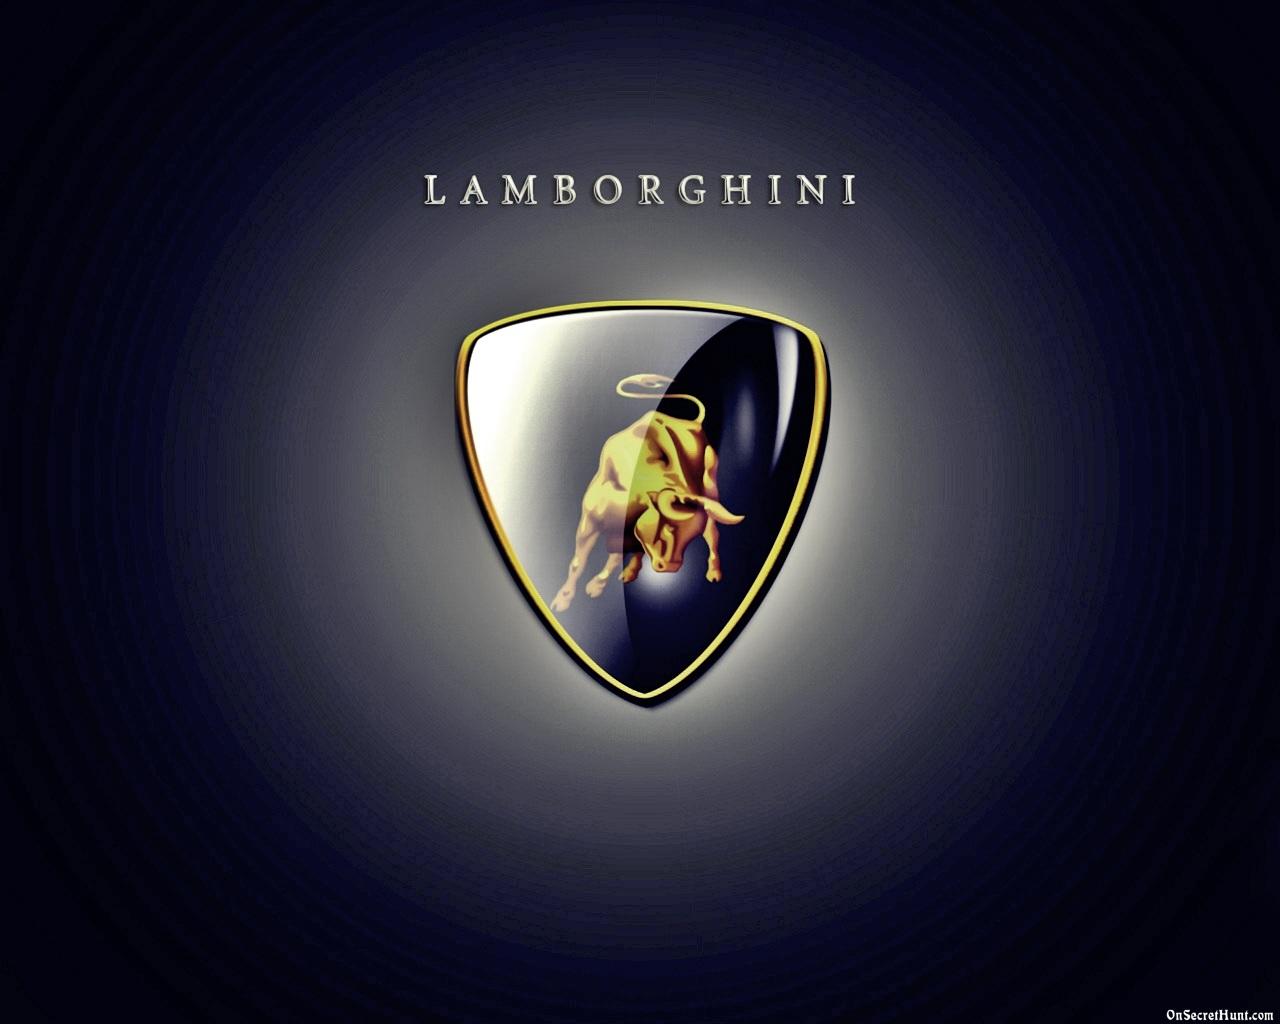 Lamborghini Logo Wallpapers HD Wallpapers Early 1280x1024